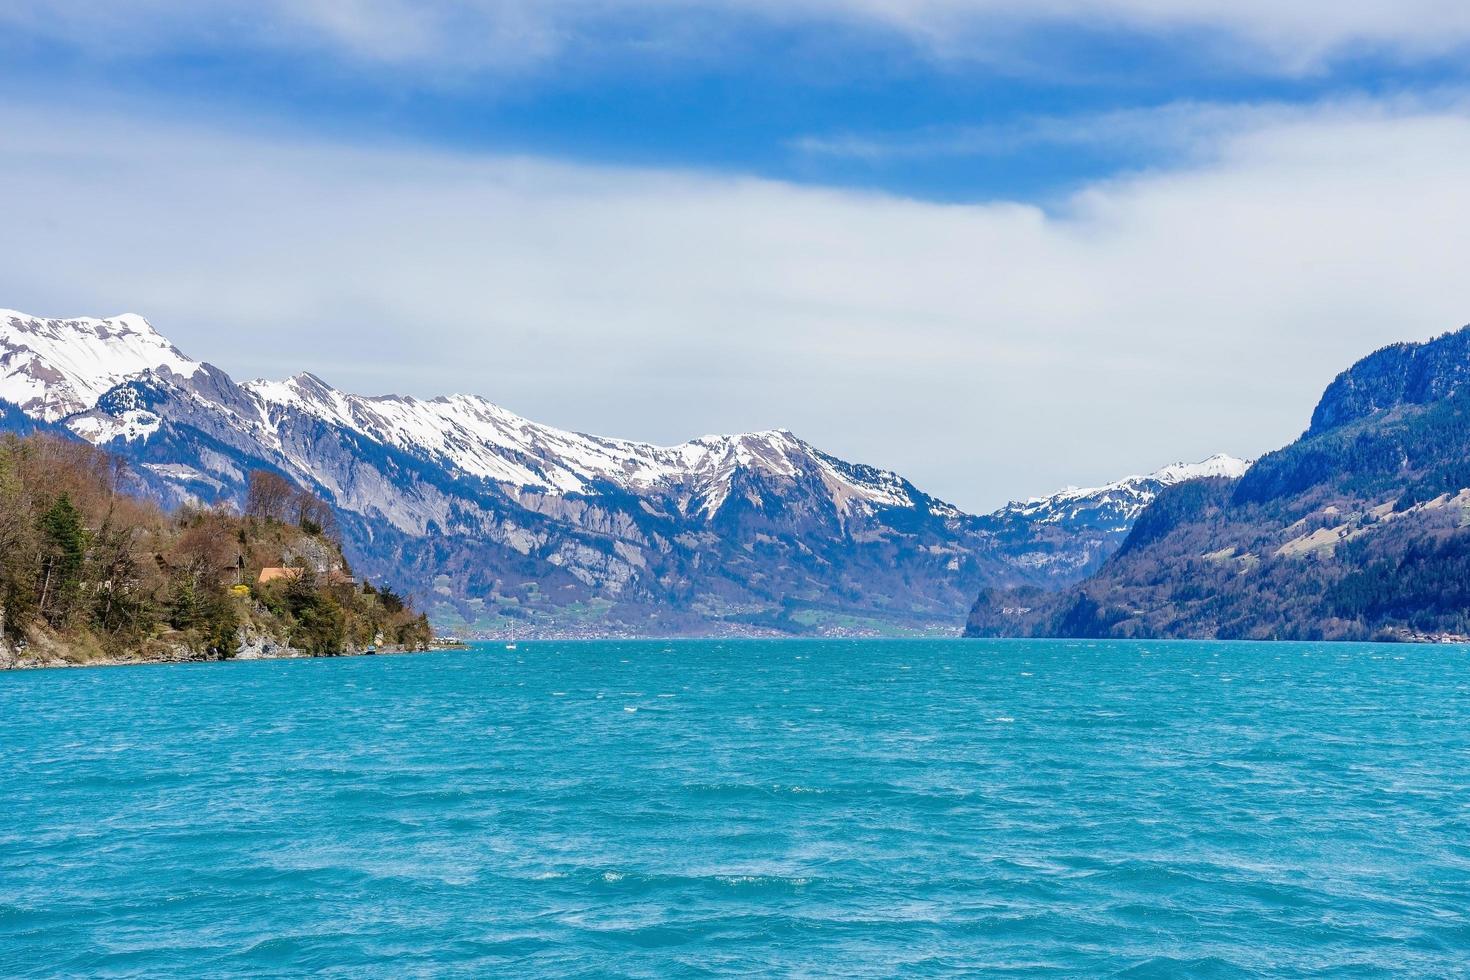 bella vista estiva del lago di brienz a berna, svizzera foto